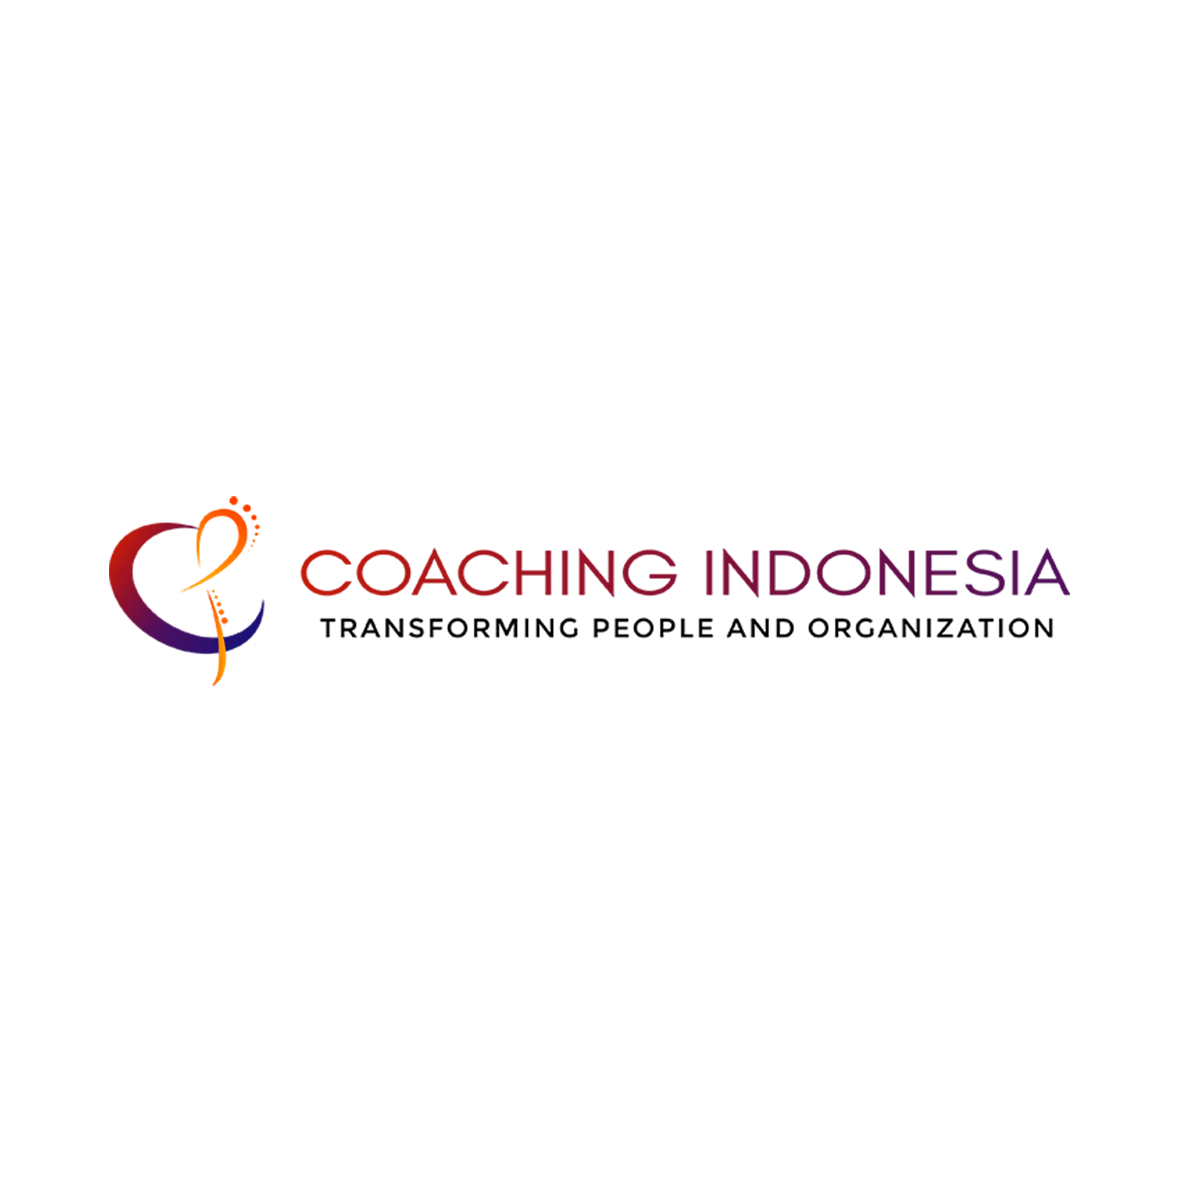 Coaching Indonesia Sq